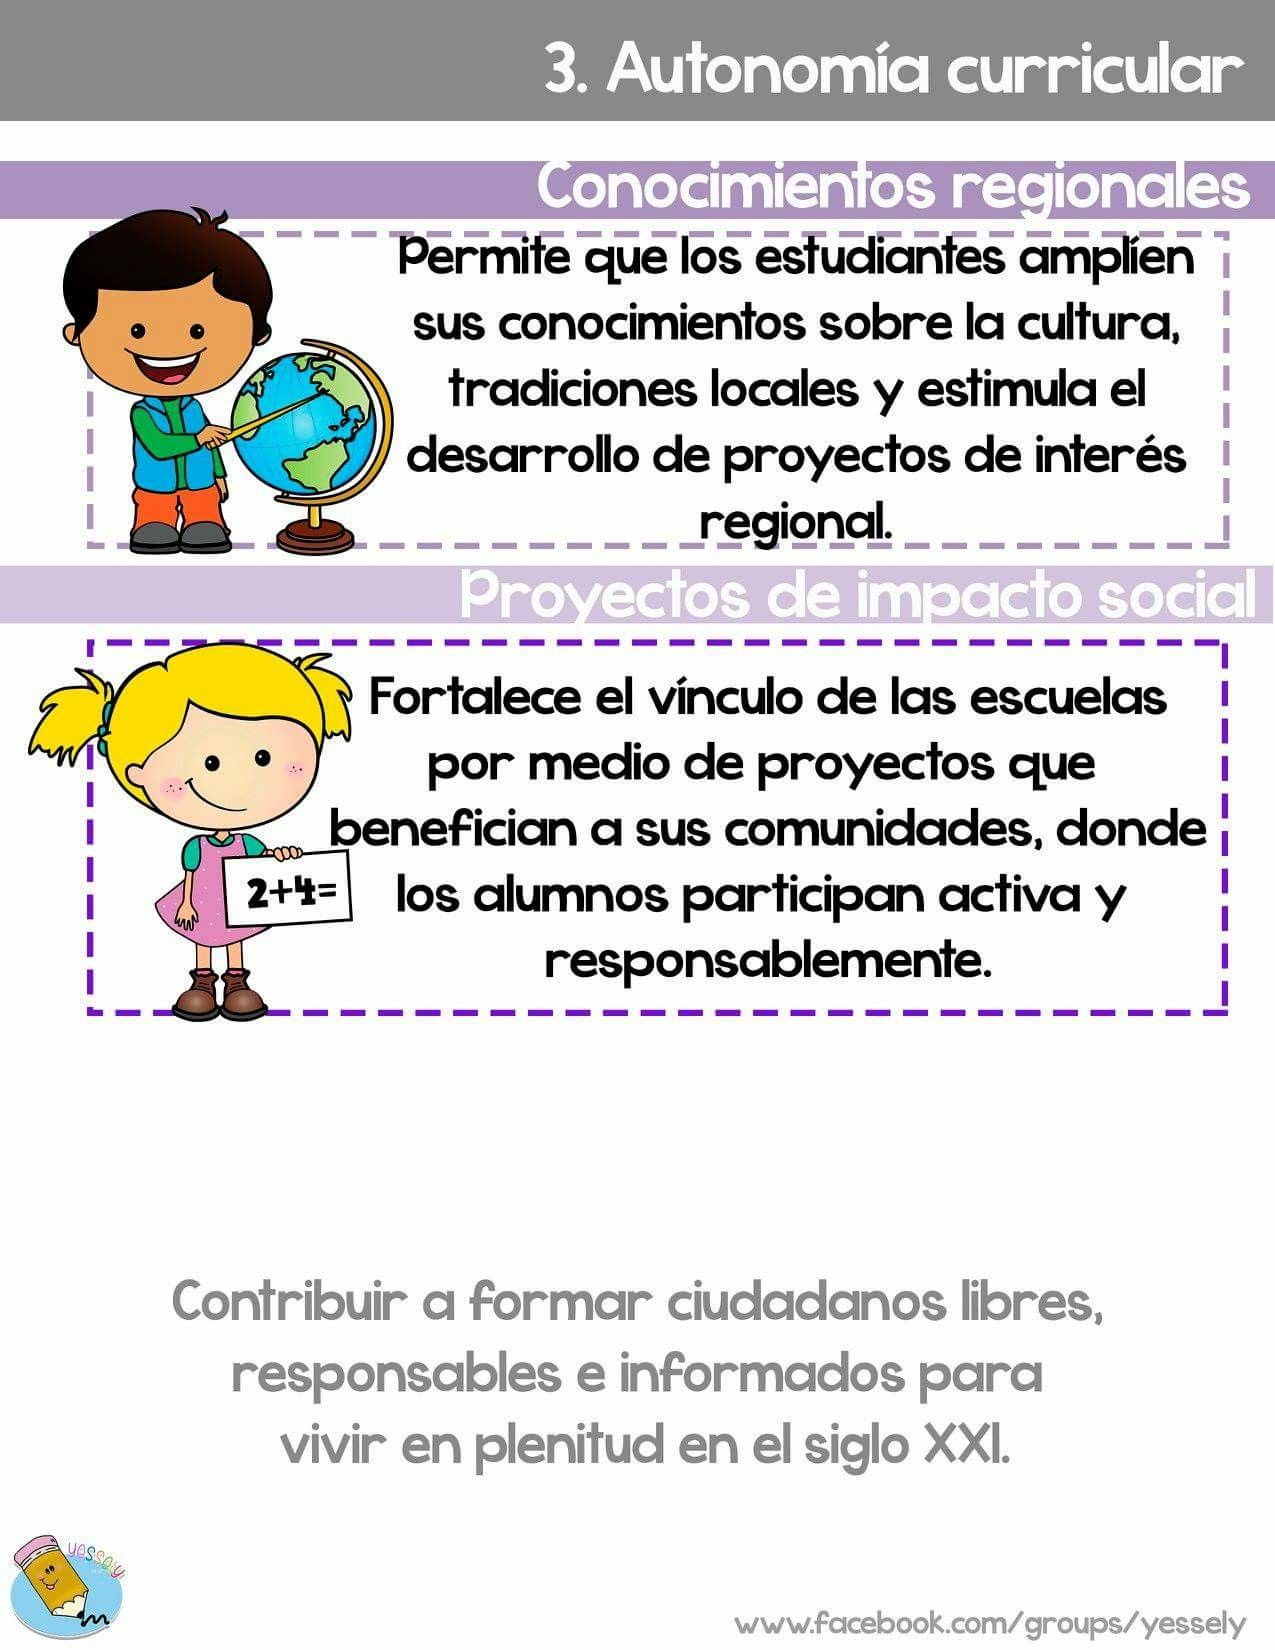 Pin de Cony Moib en Educacion   Pinterest   Aprendizaje, Preescolar ...